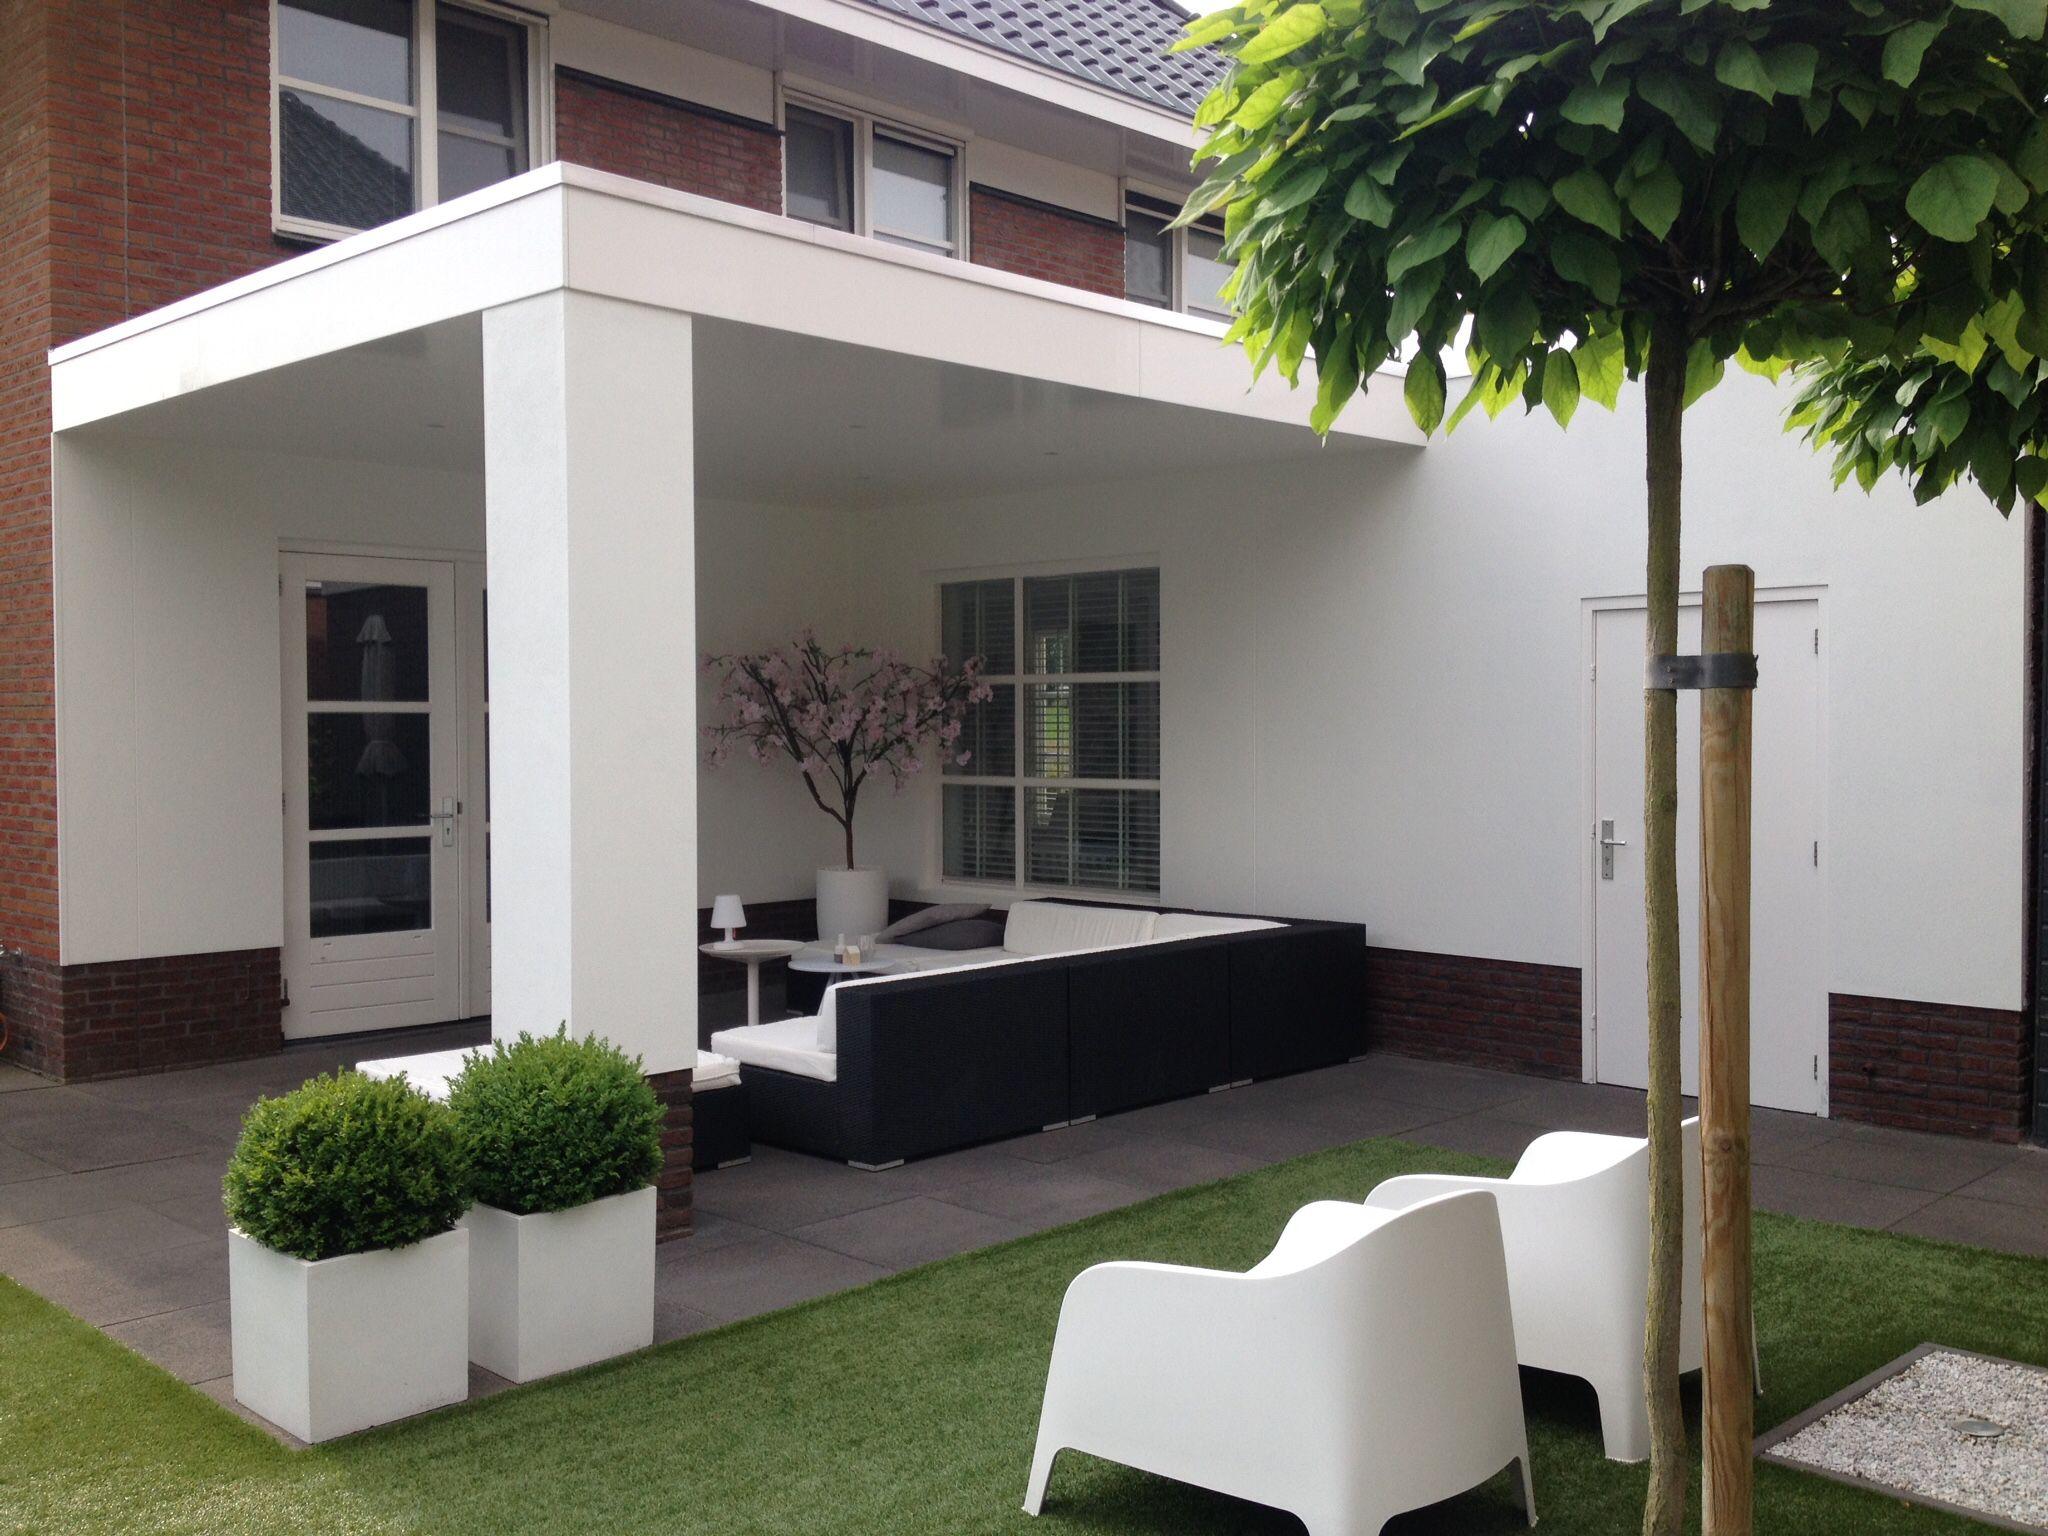 Overkapping aan huis tuin pinterest veranda 39 s - Moderne lounge stijl ...